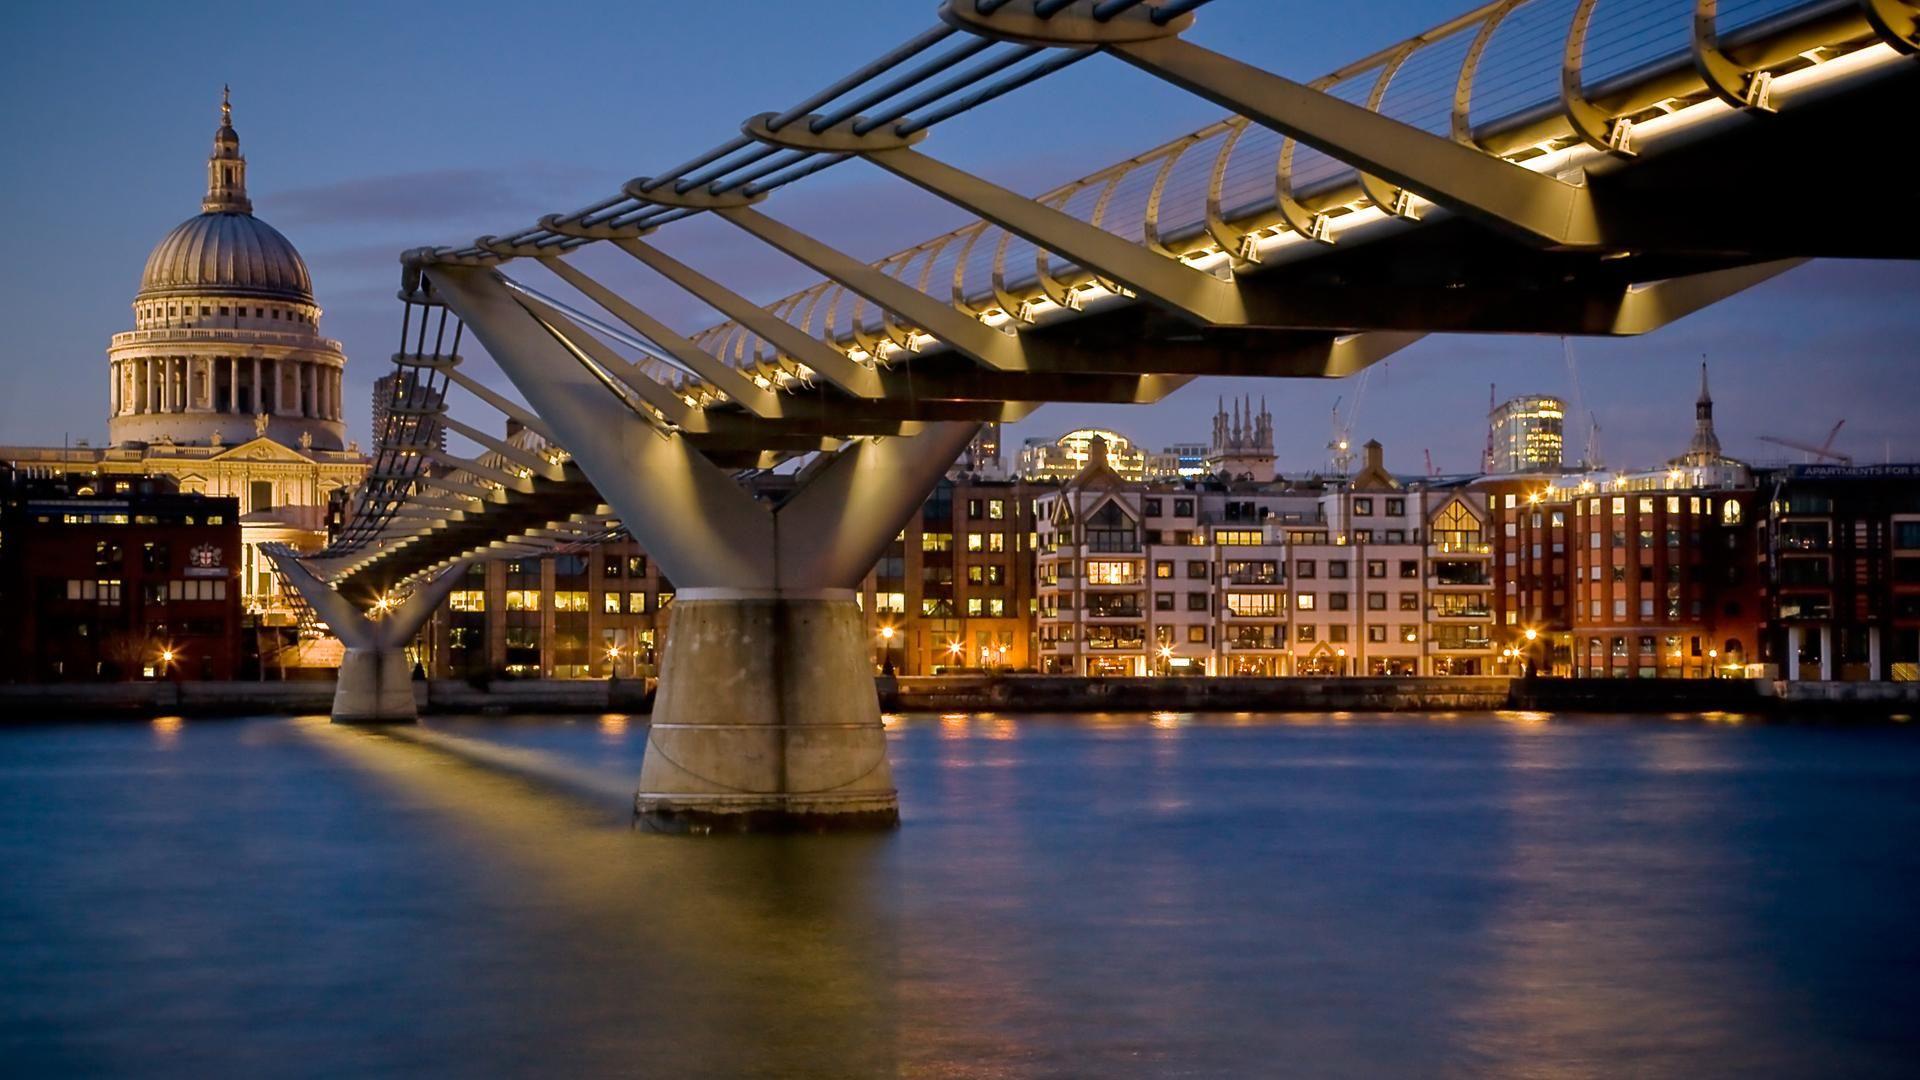 Bridges Cities Photo Wallpaper Image Download On The Desktop Pc, Tablet